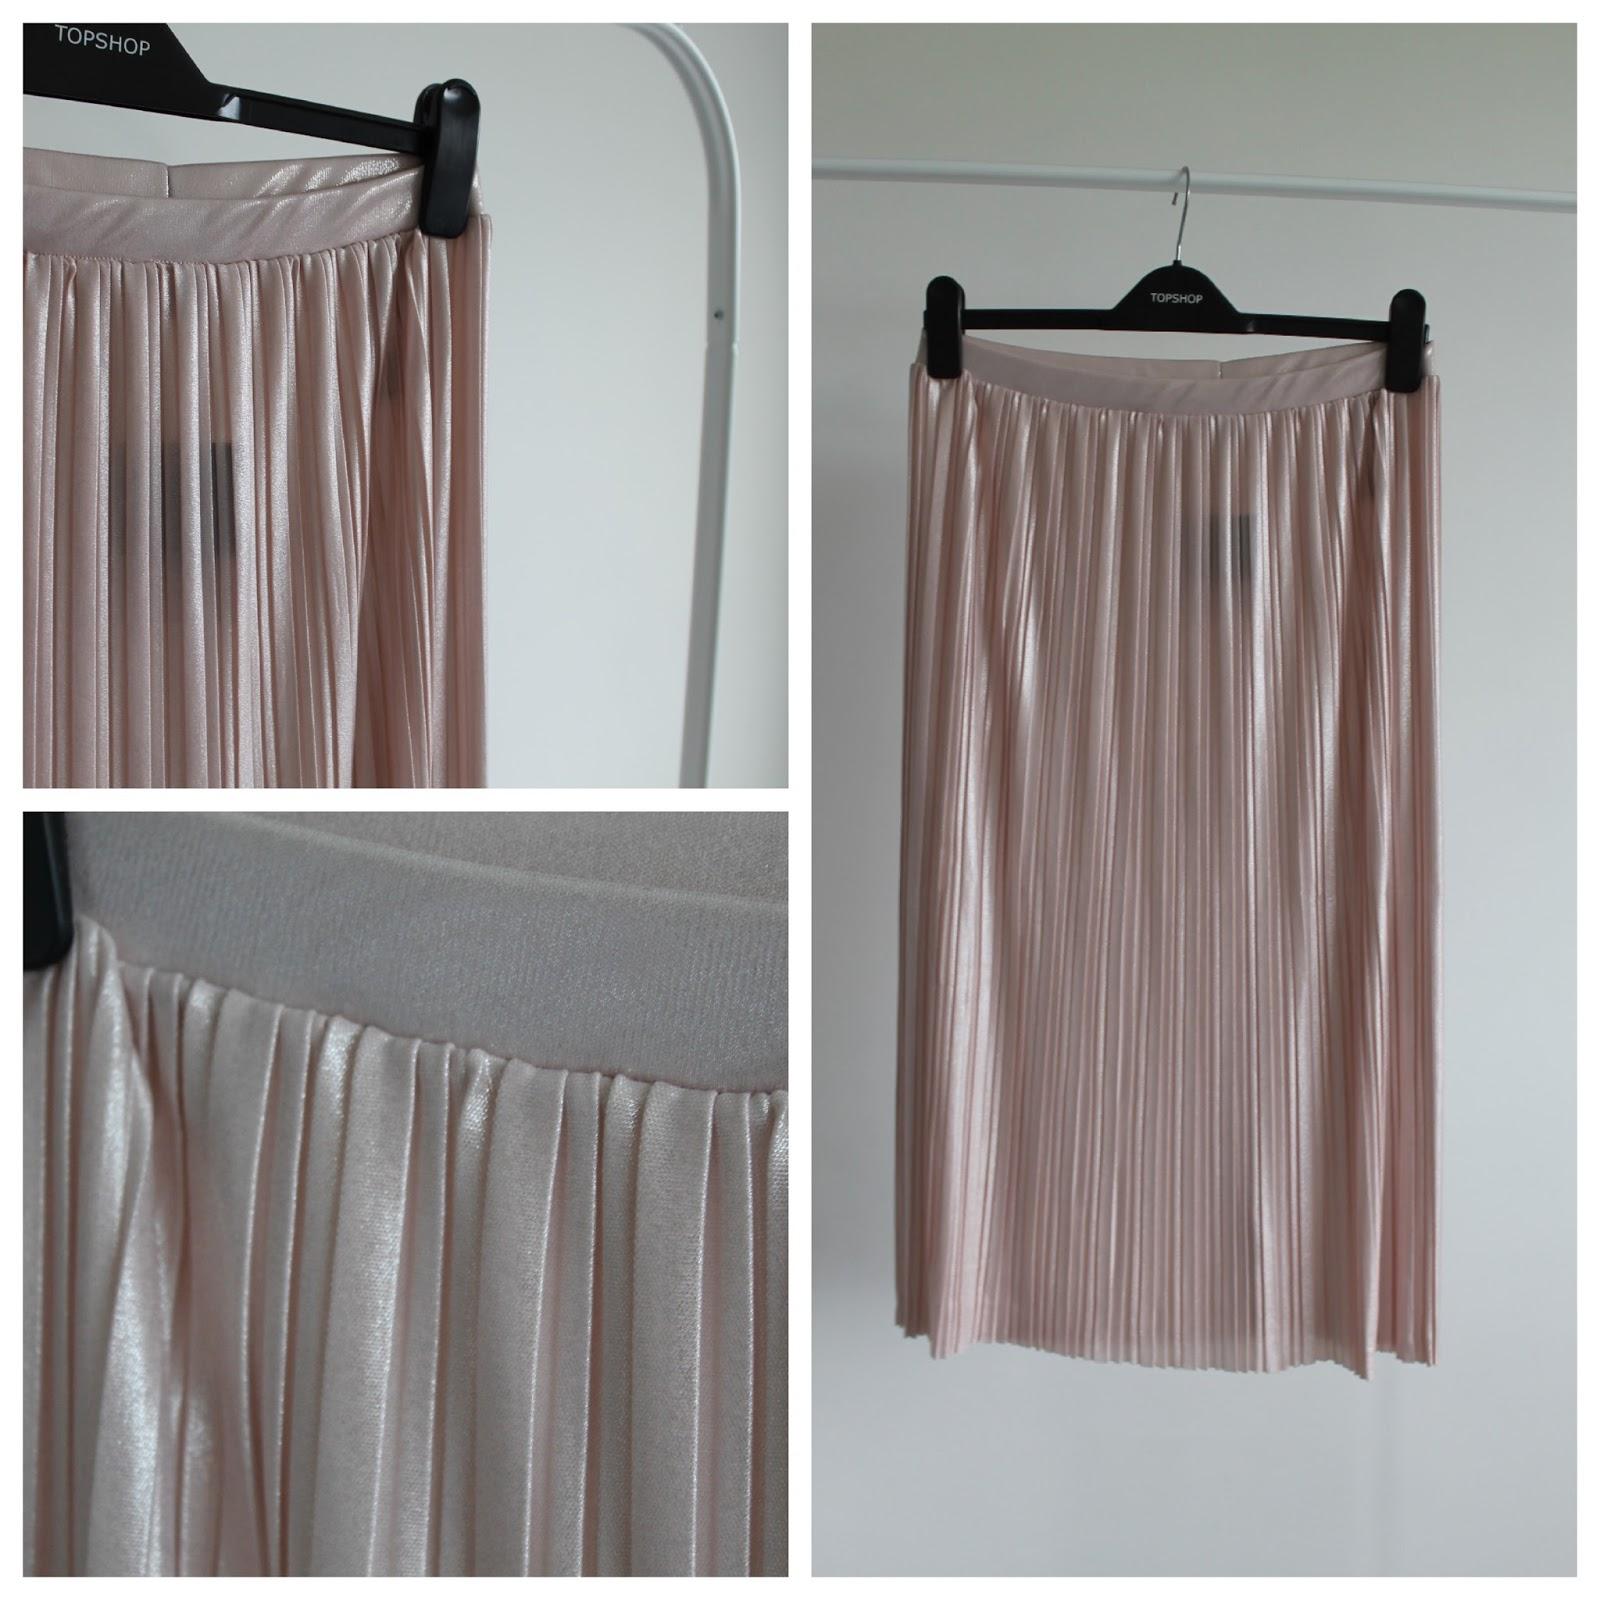 ca1d0aabc5 Topshop Metallic Jersey Pleated Skirt